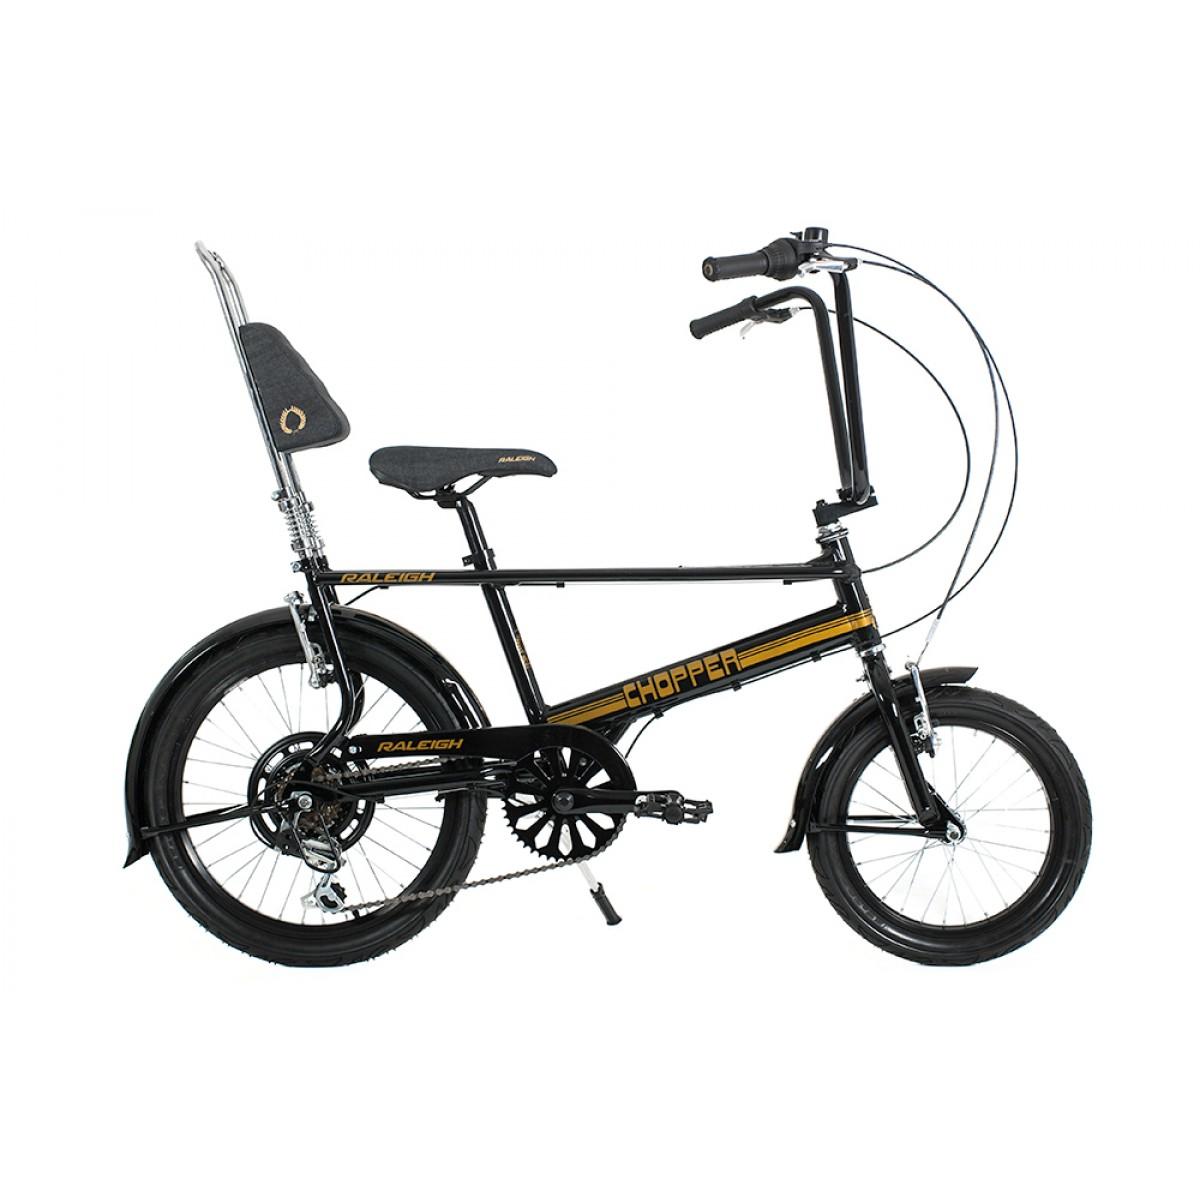 chopper bike - photo #33